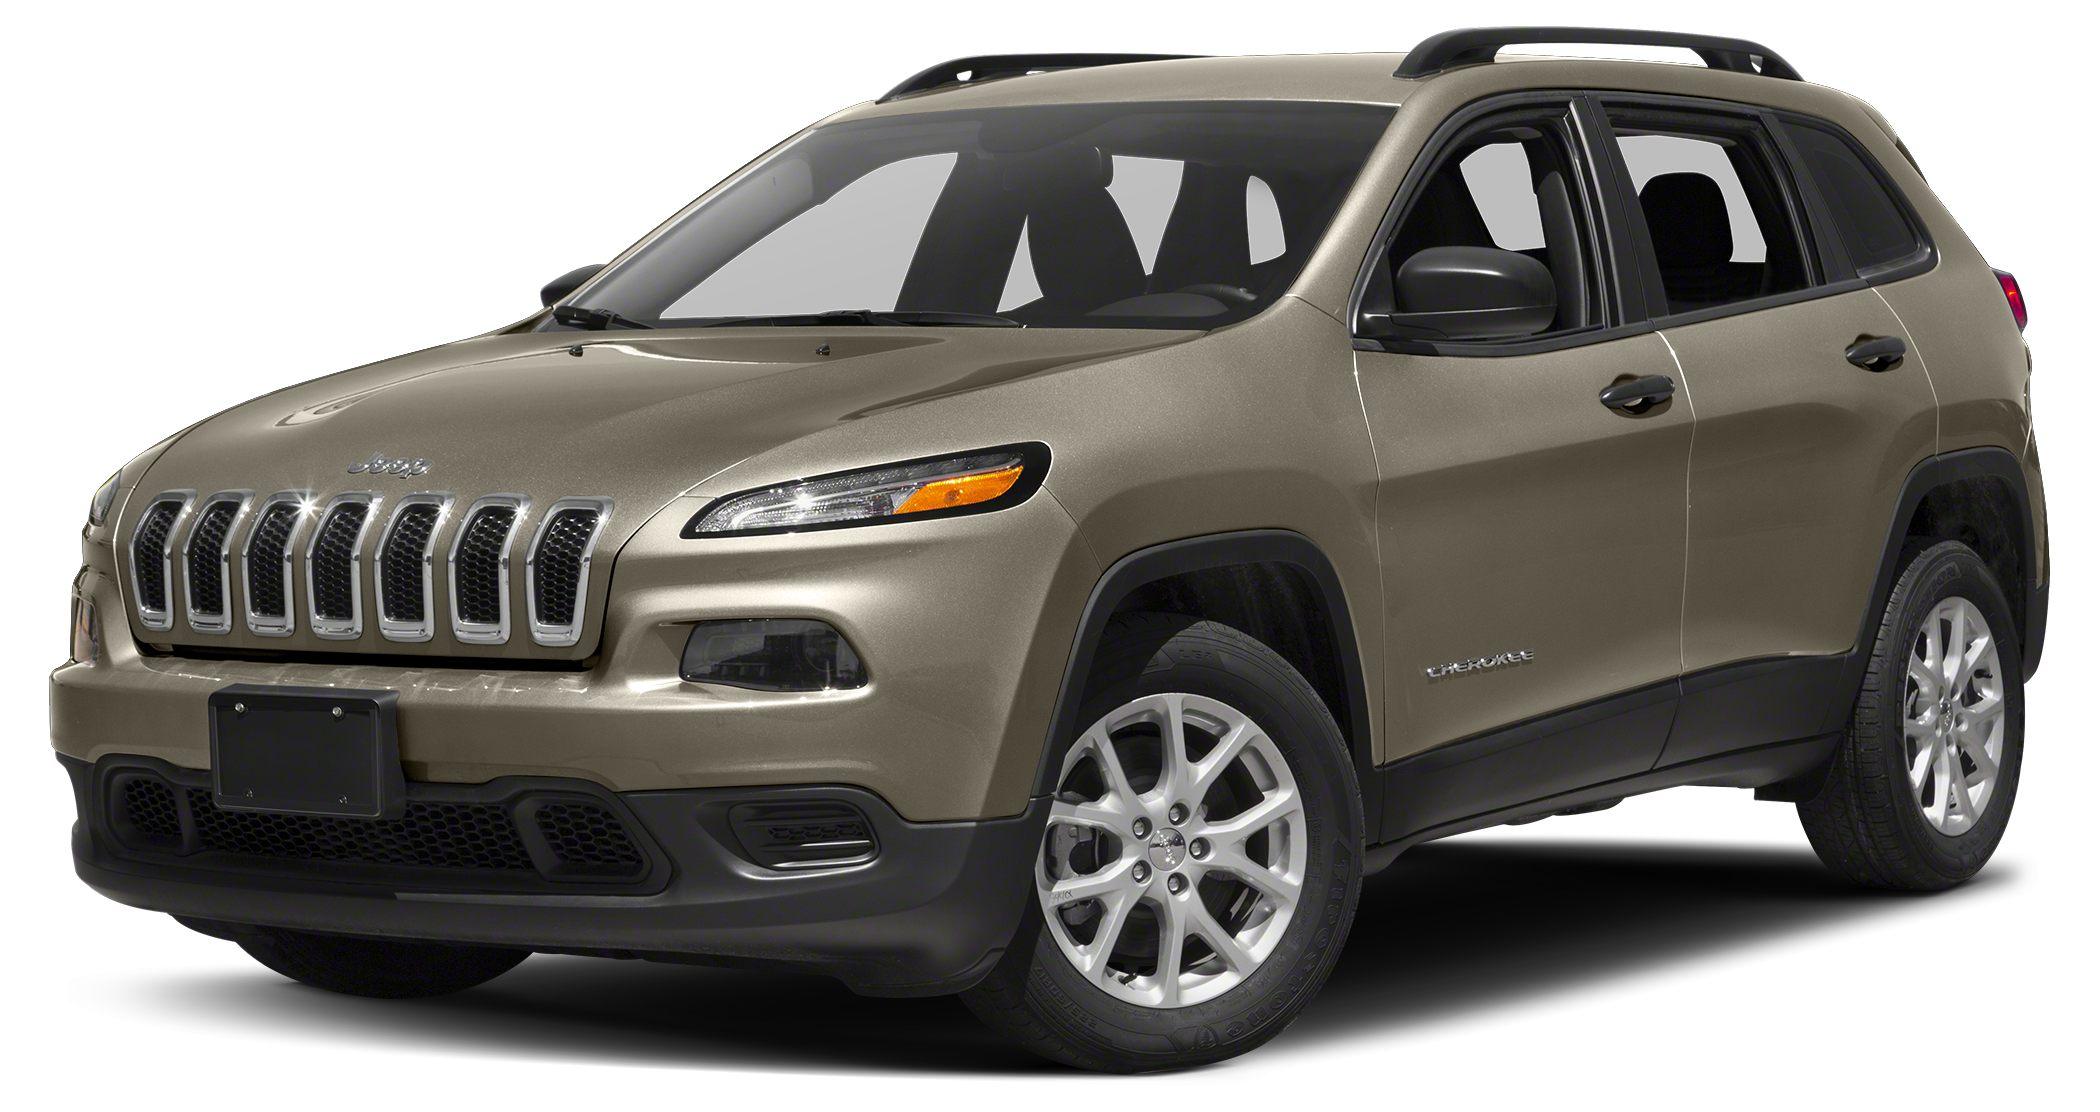 2016 Jeep Cherokee Sport Miles 4Color Light Brownstone Pearlcoat Stock JC366 VIN 1C4PJMAS6GW